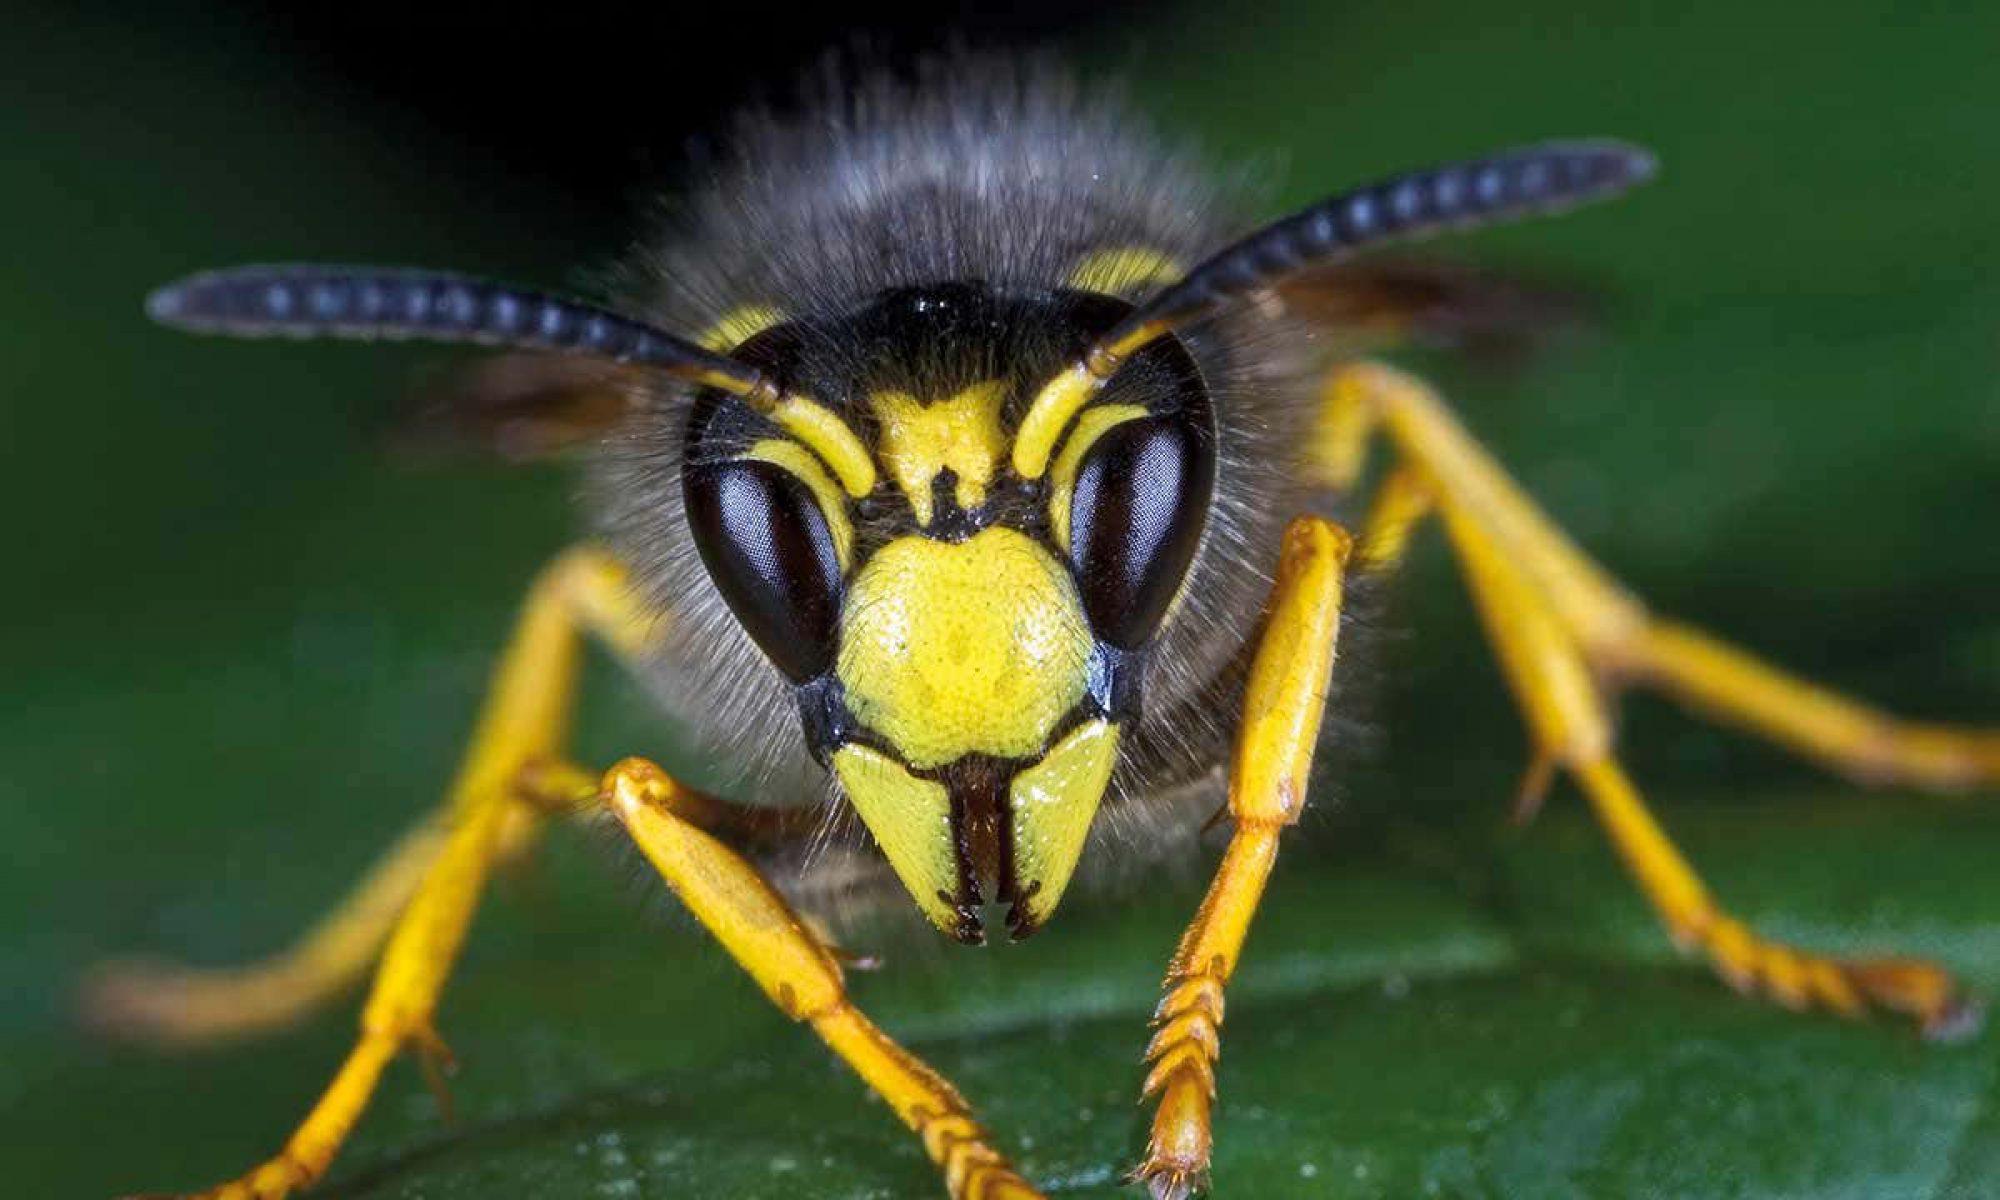 Wespenverdelgingherne.be